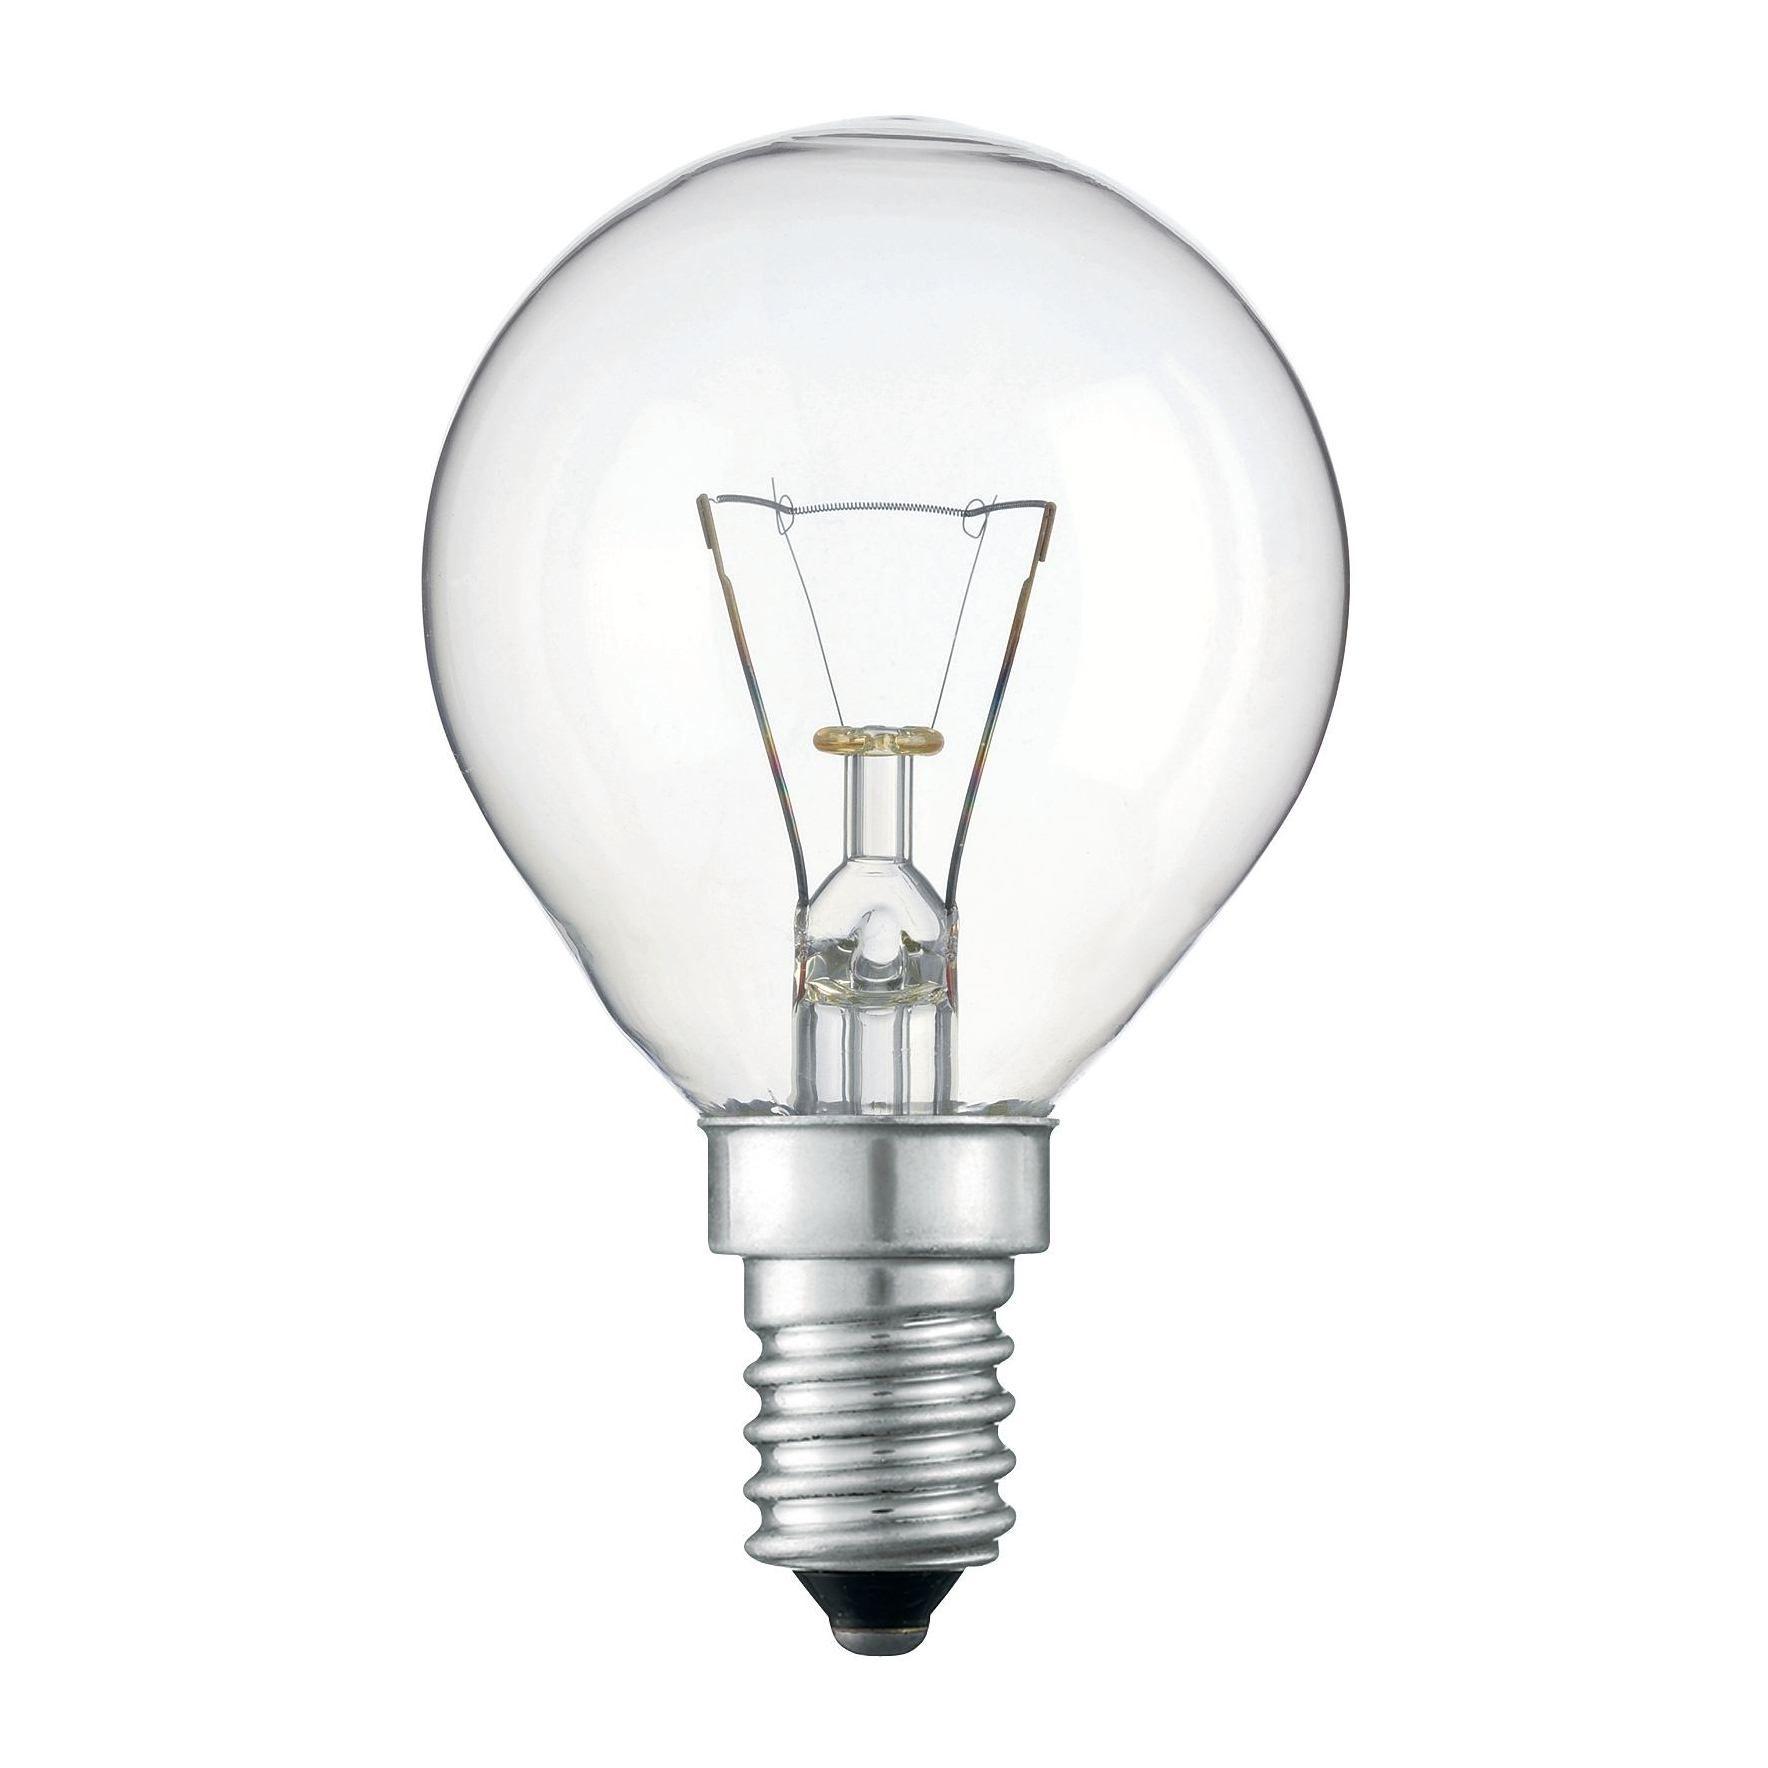 Купить Лампа накаливания Philips P45 40W 230V E14 CL.1CT/10X10F прозрачная